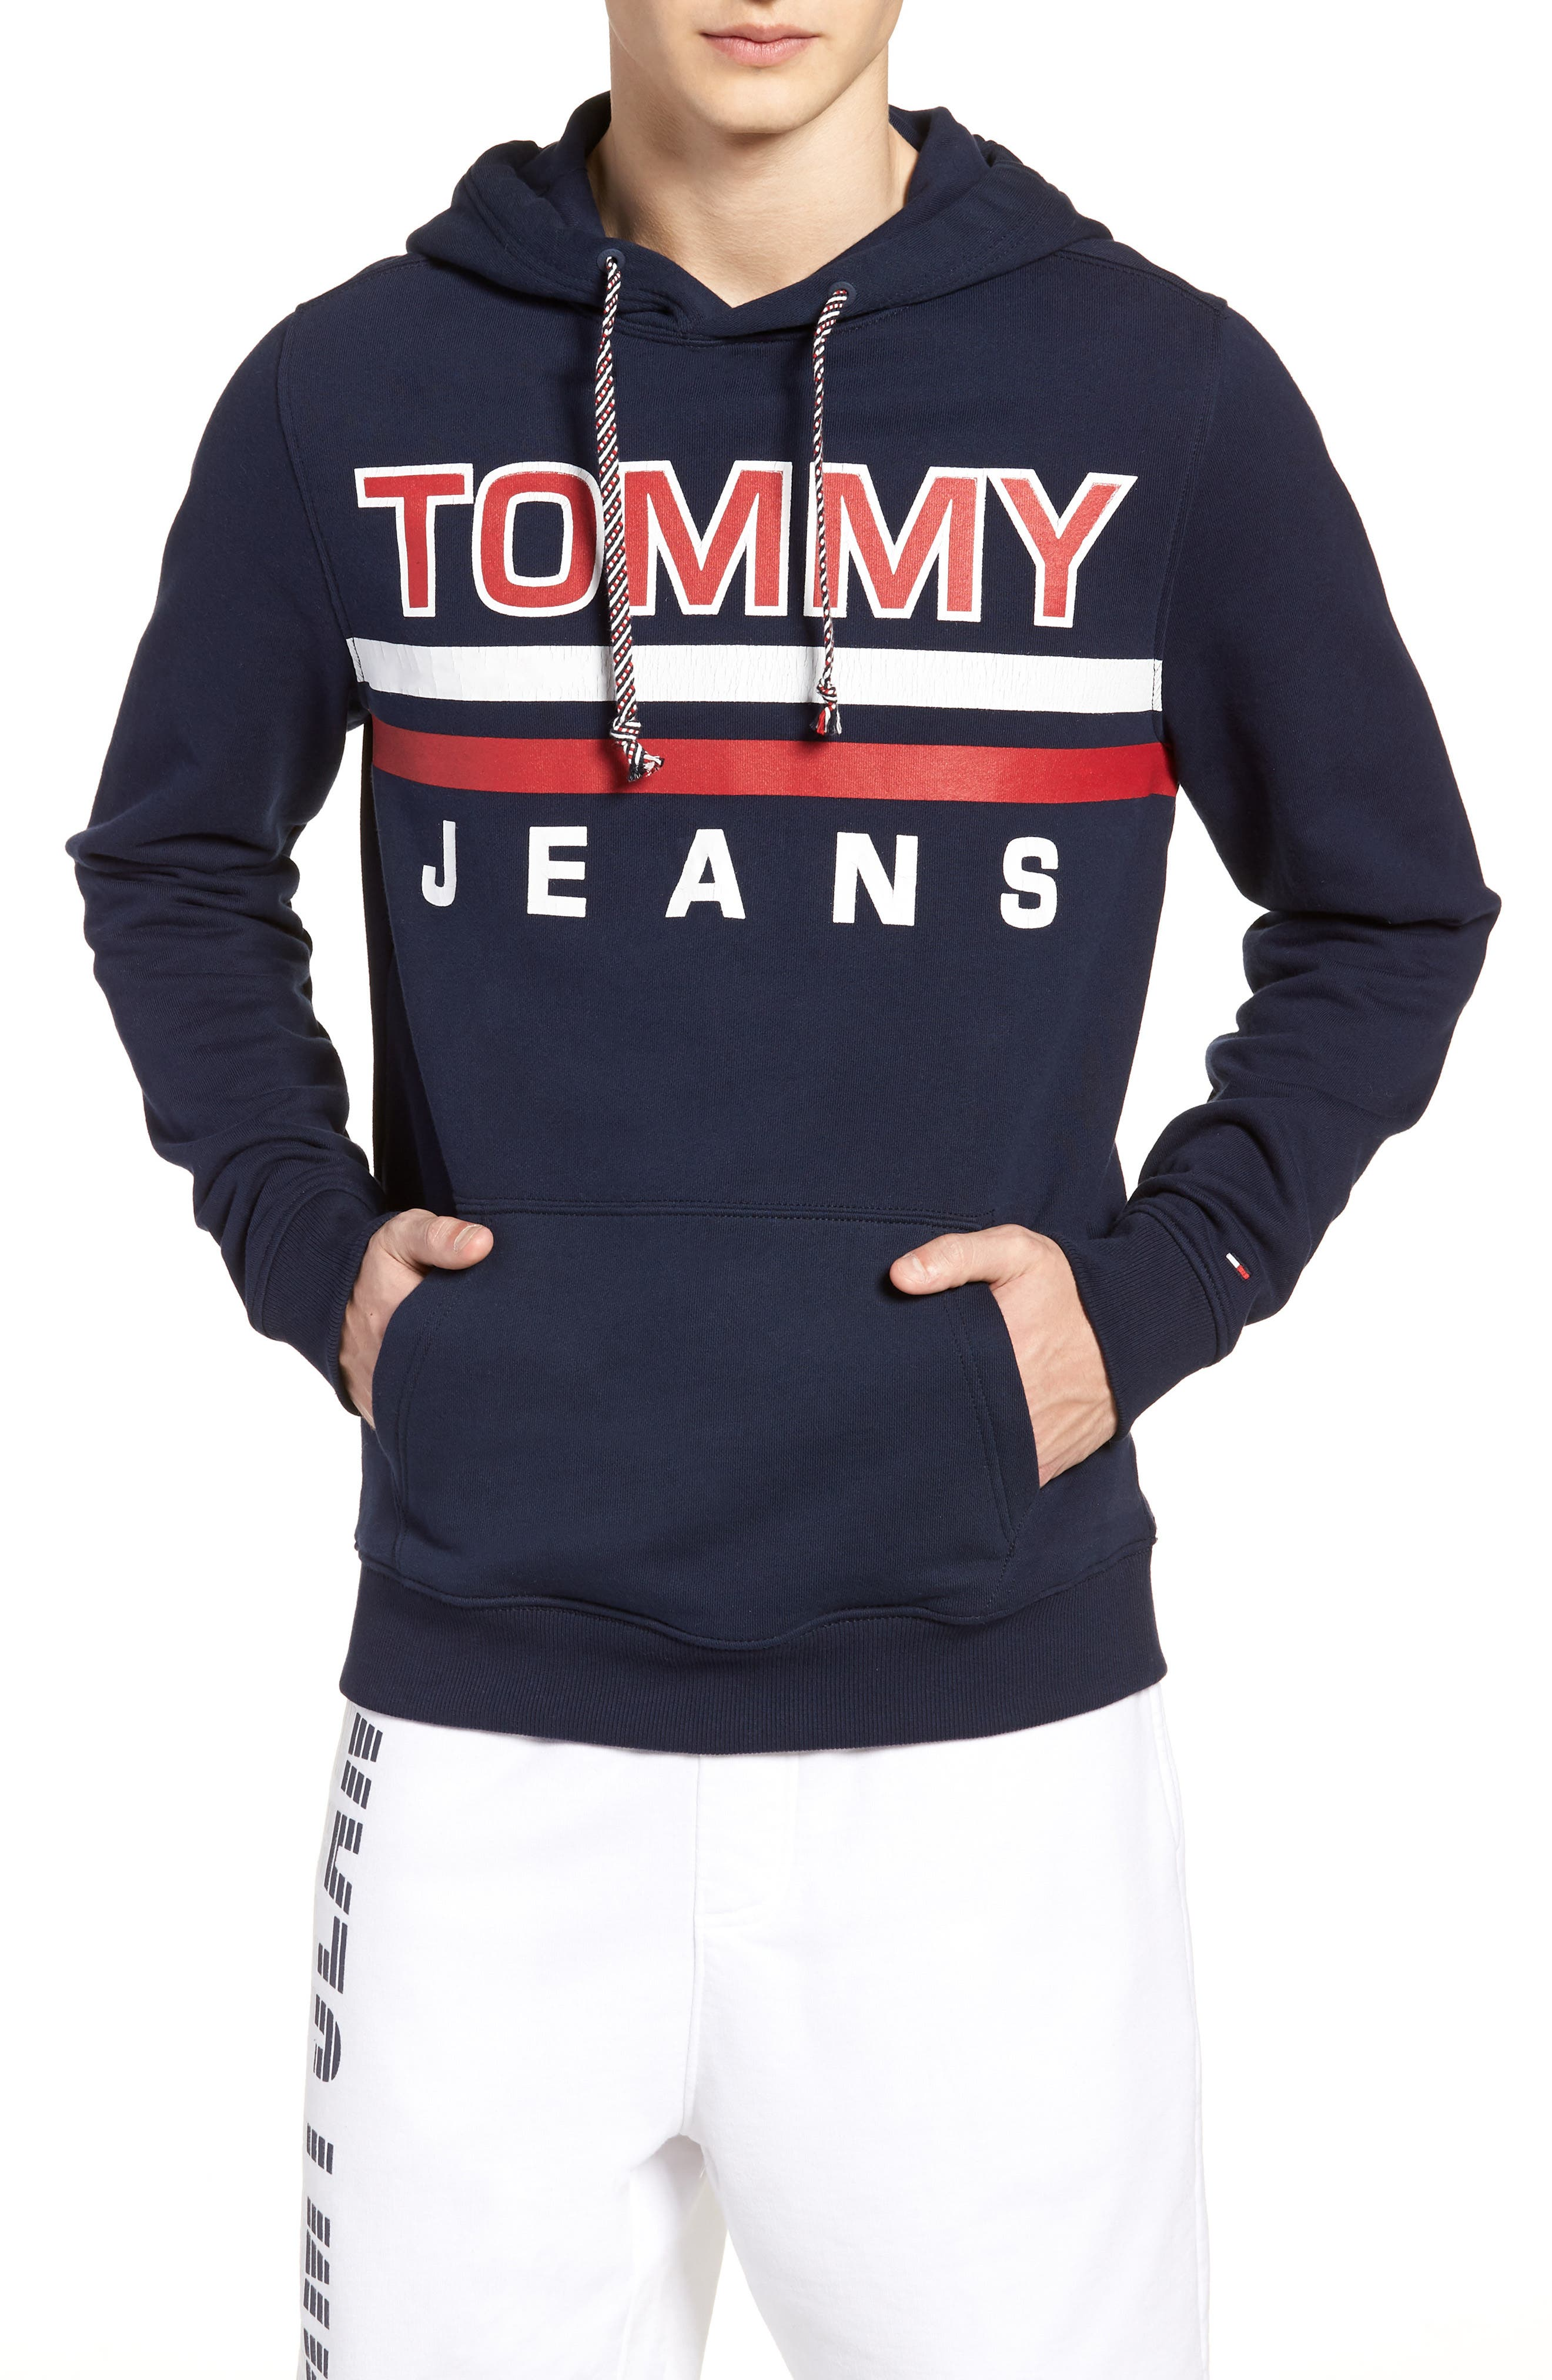 Main Image - TOMMY JEANS Essential Graphic Hoodie Sweatshirt